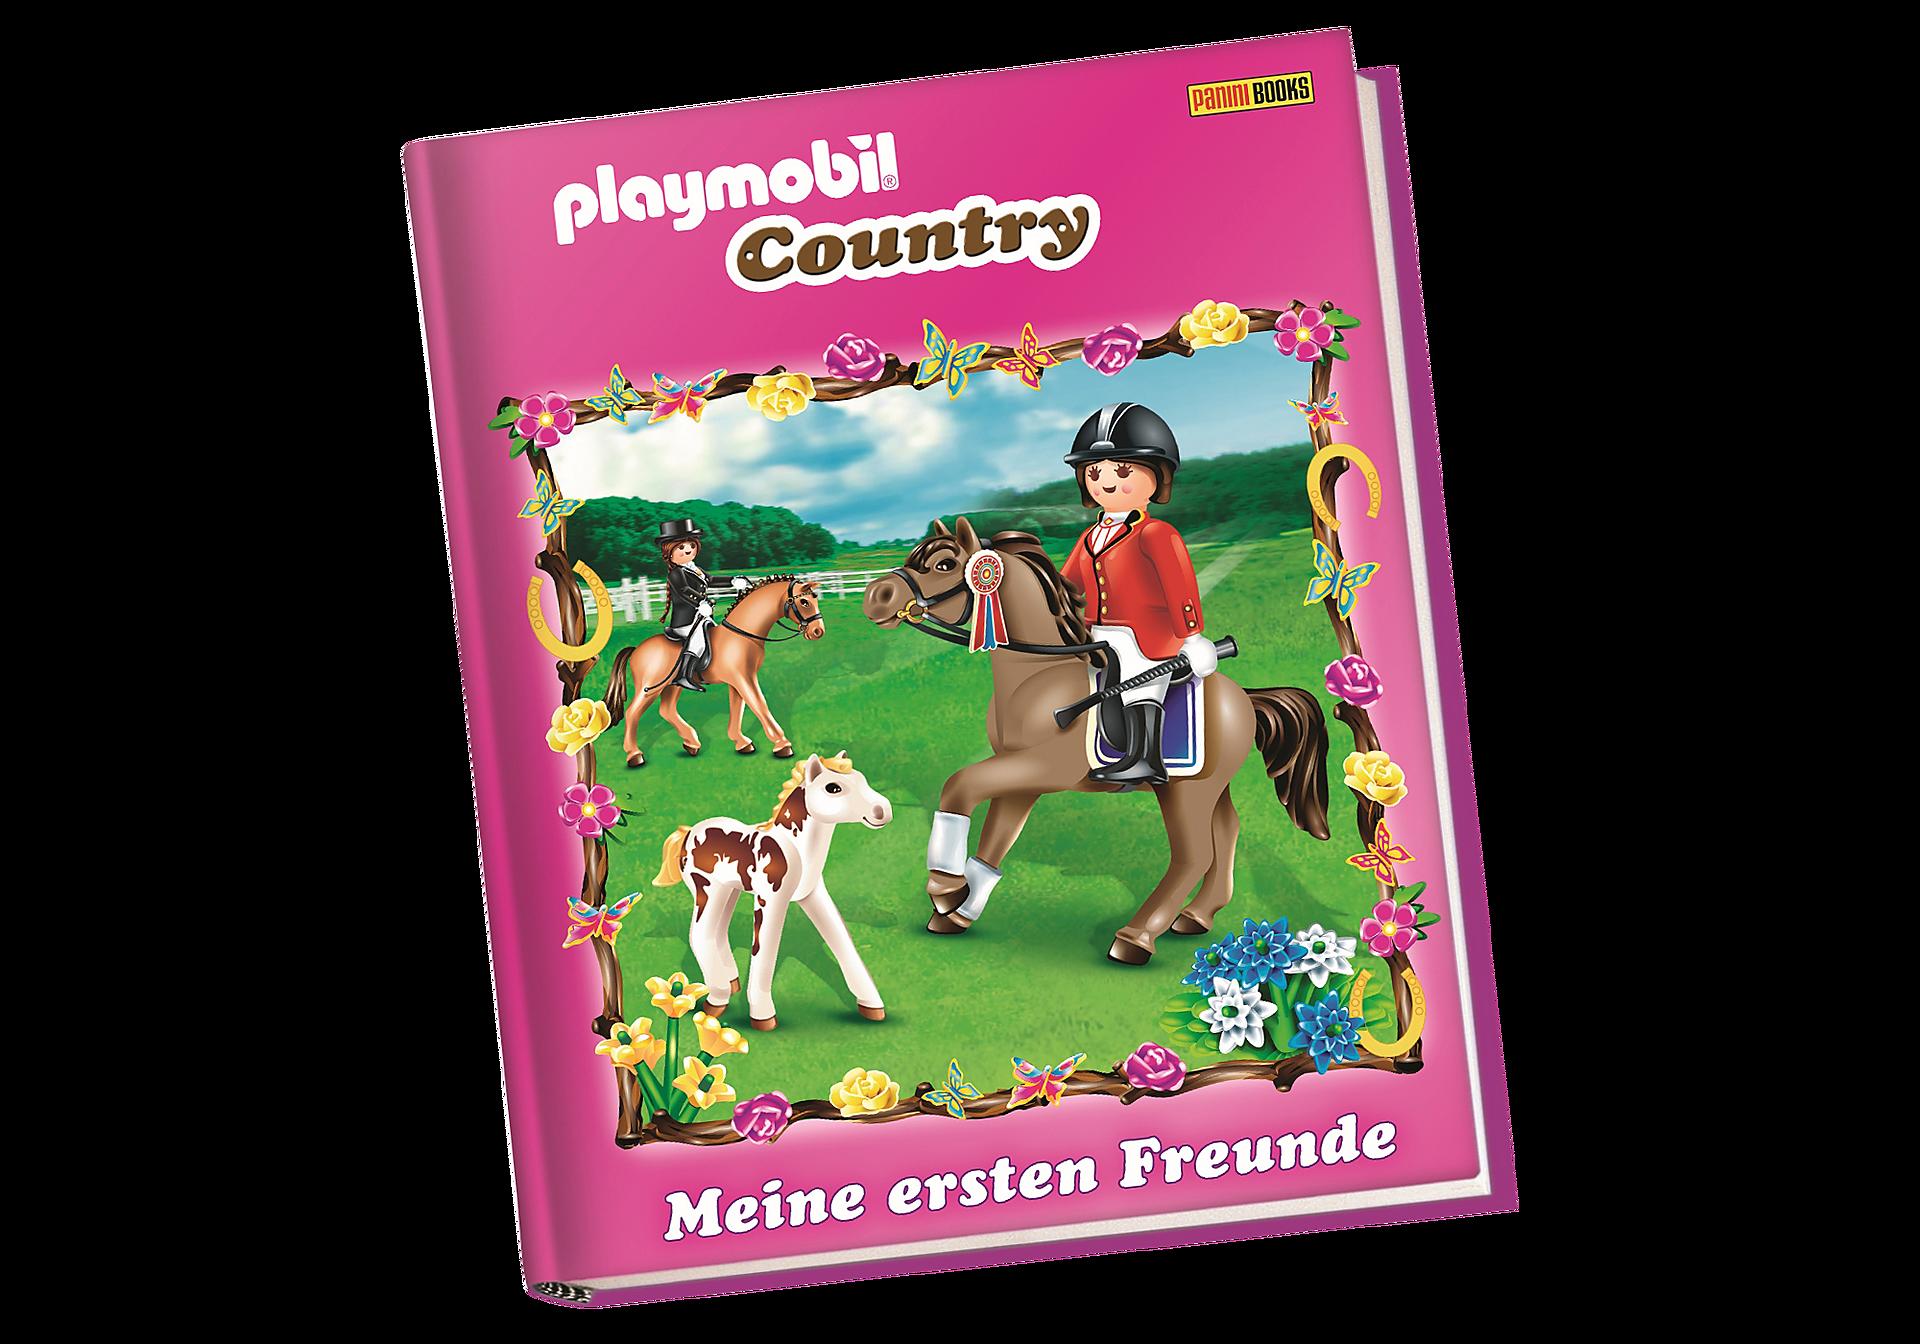 http://media.playmobil.com/i/playmobil/80377_product_detail/Freundealbum - Meine ersten Freunde (Country)